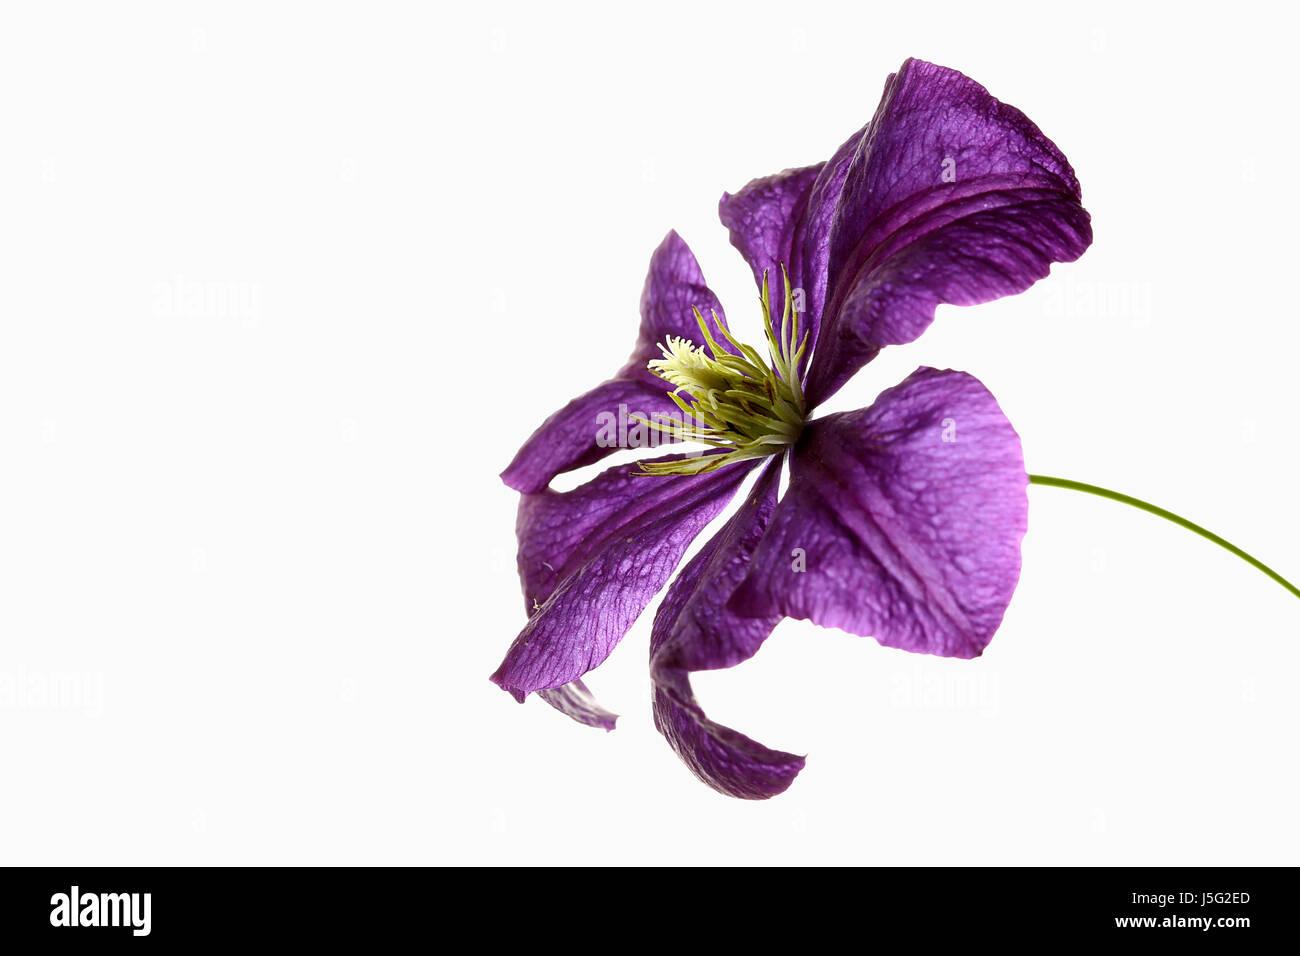 Clematis studio shot of single purple flower with yellow stamen clematis studio shot of single purple flower with yellow stamen mightylinksfo Choice Image